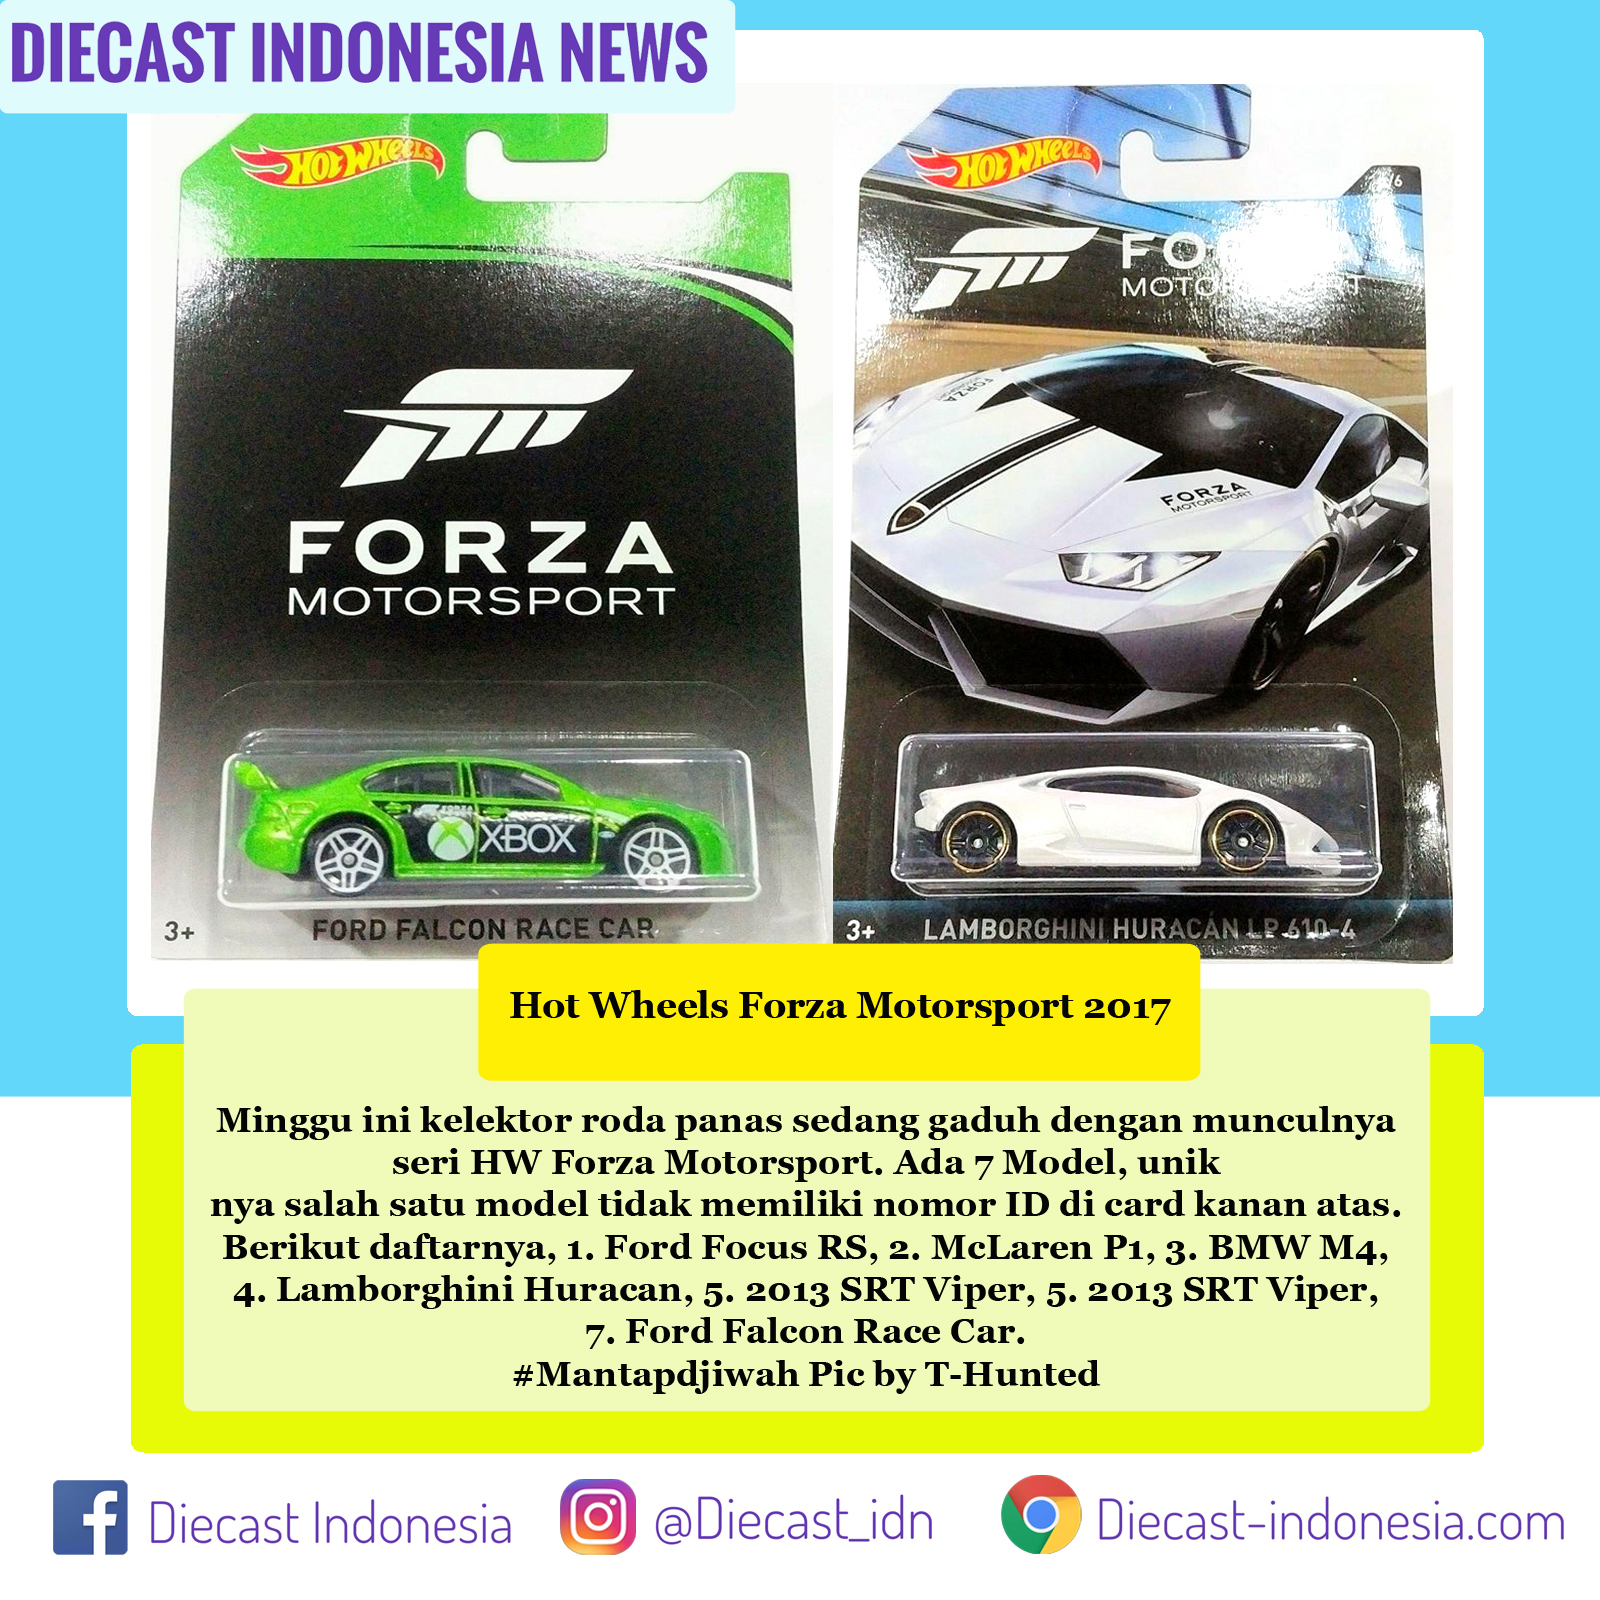 1:64 Hot Wheels Forza Motorsport XBox Ford Falcon Chase Car Rare!